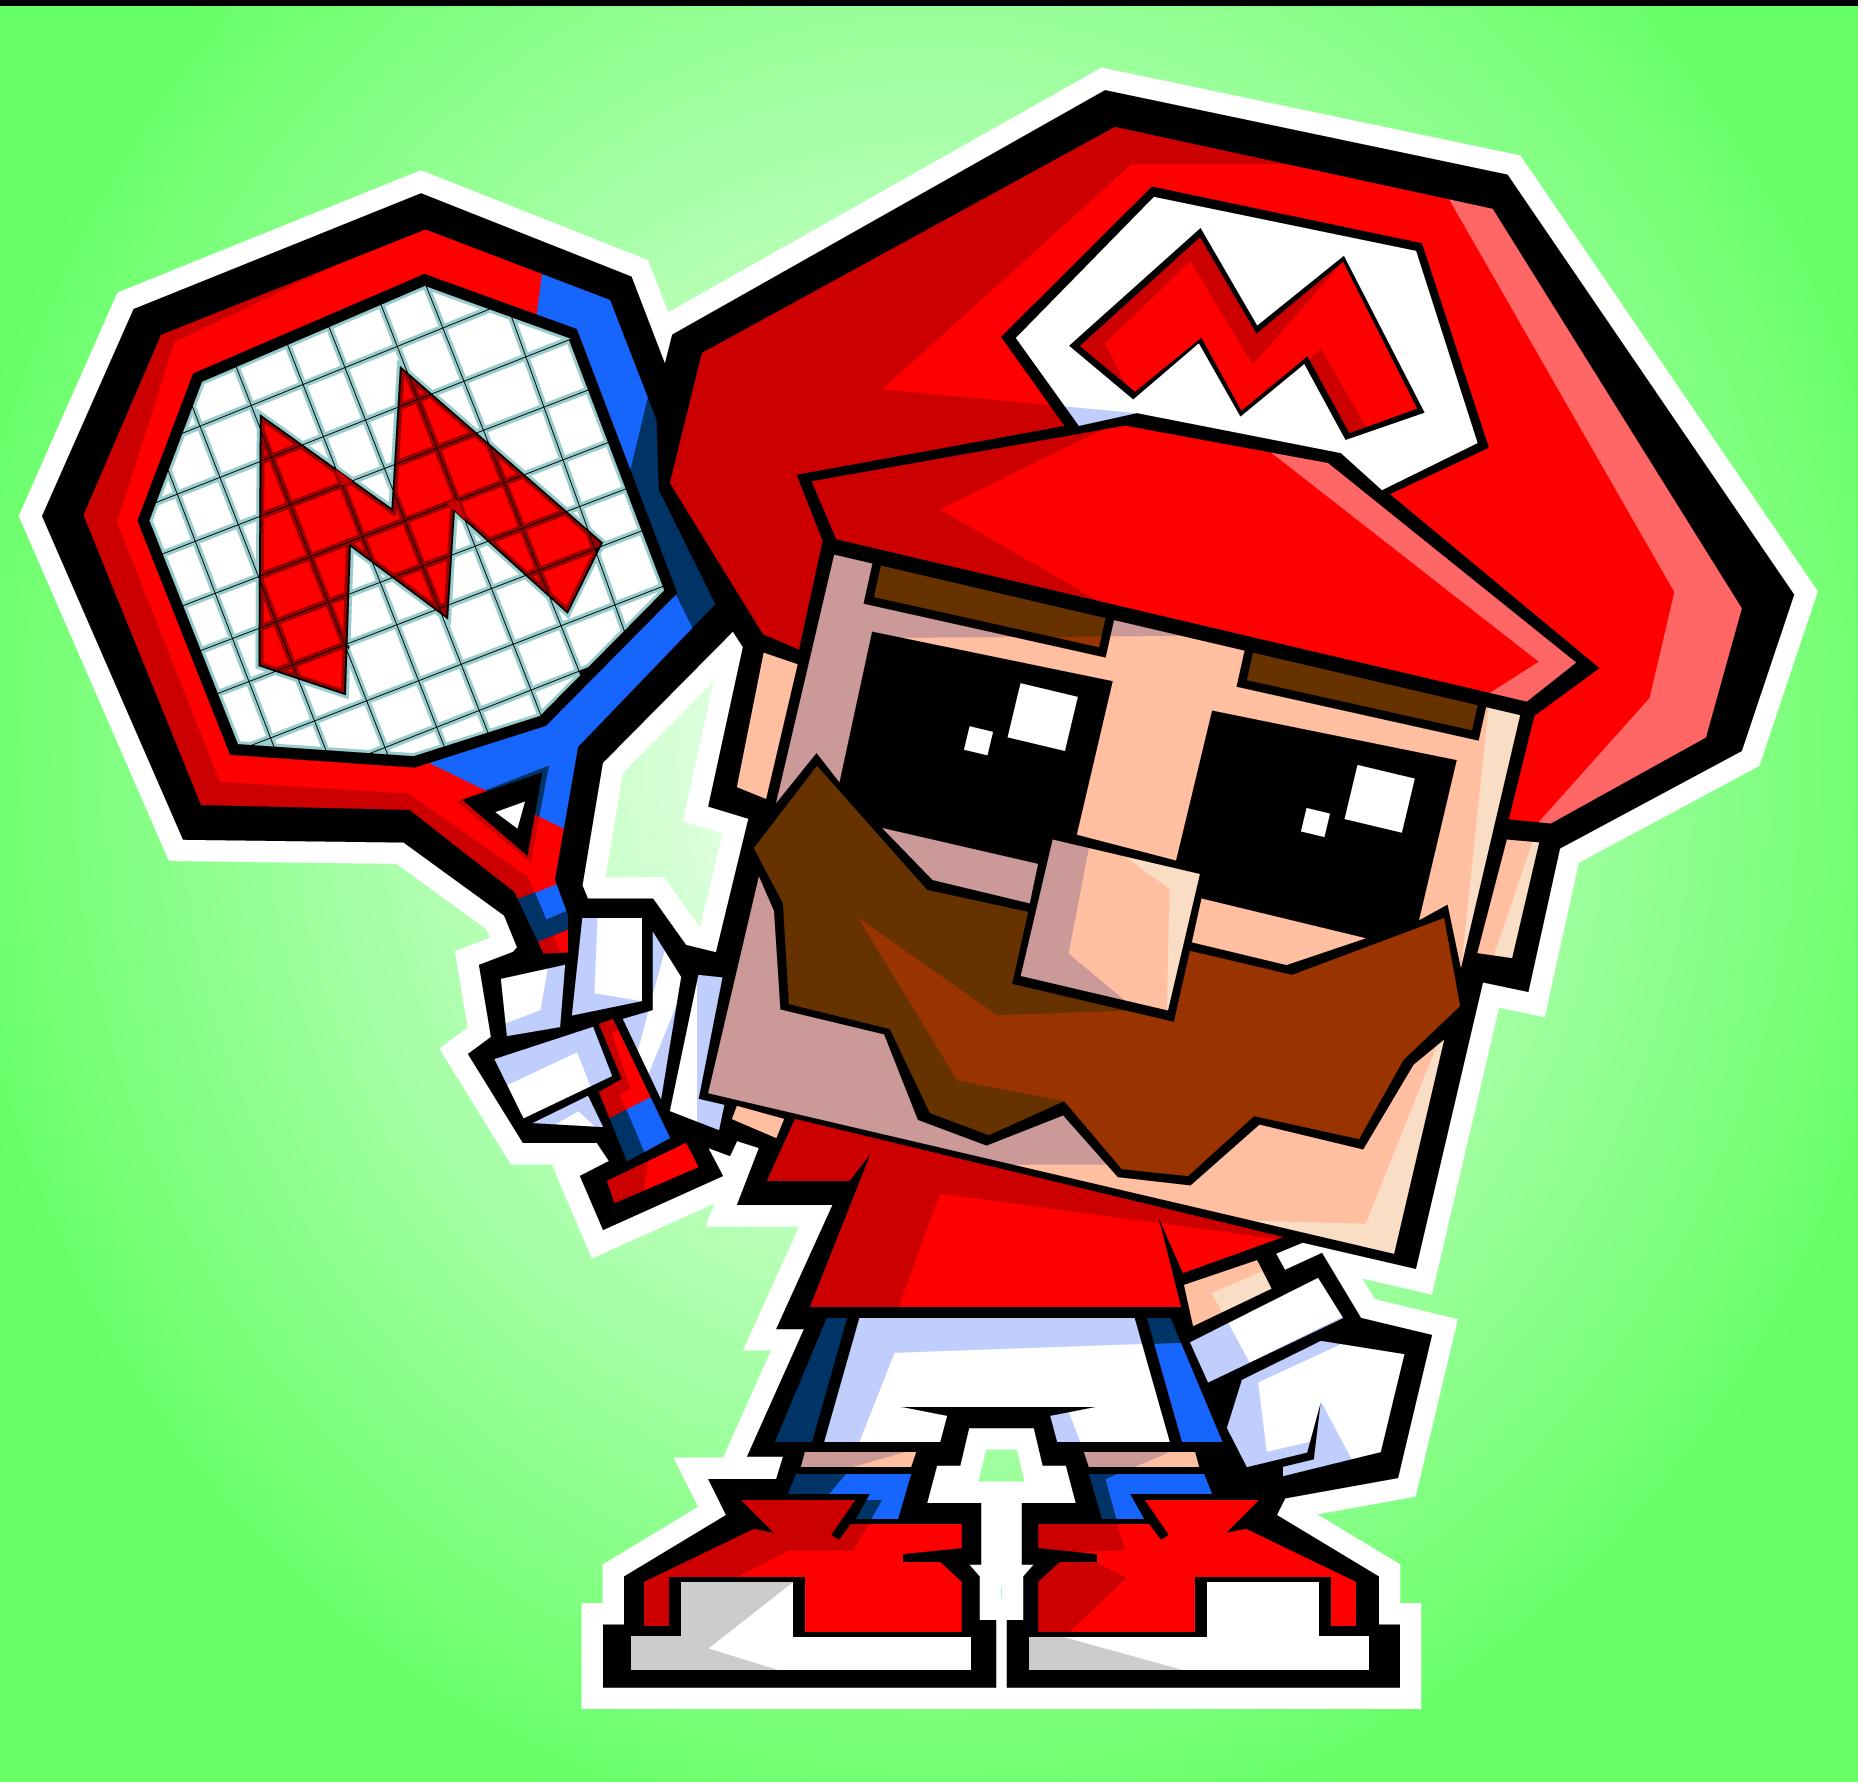 Mario Tennis Aces Mario Tennis How To Draw Mario Mario Kart Draw Mario Bros How To Draw Mario Odyssey Mario Tennis Switch Mario Tenni Modele Dessin Dessin Asmr